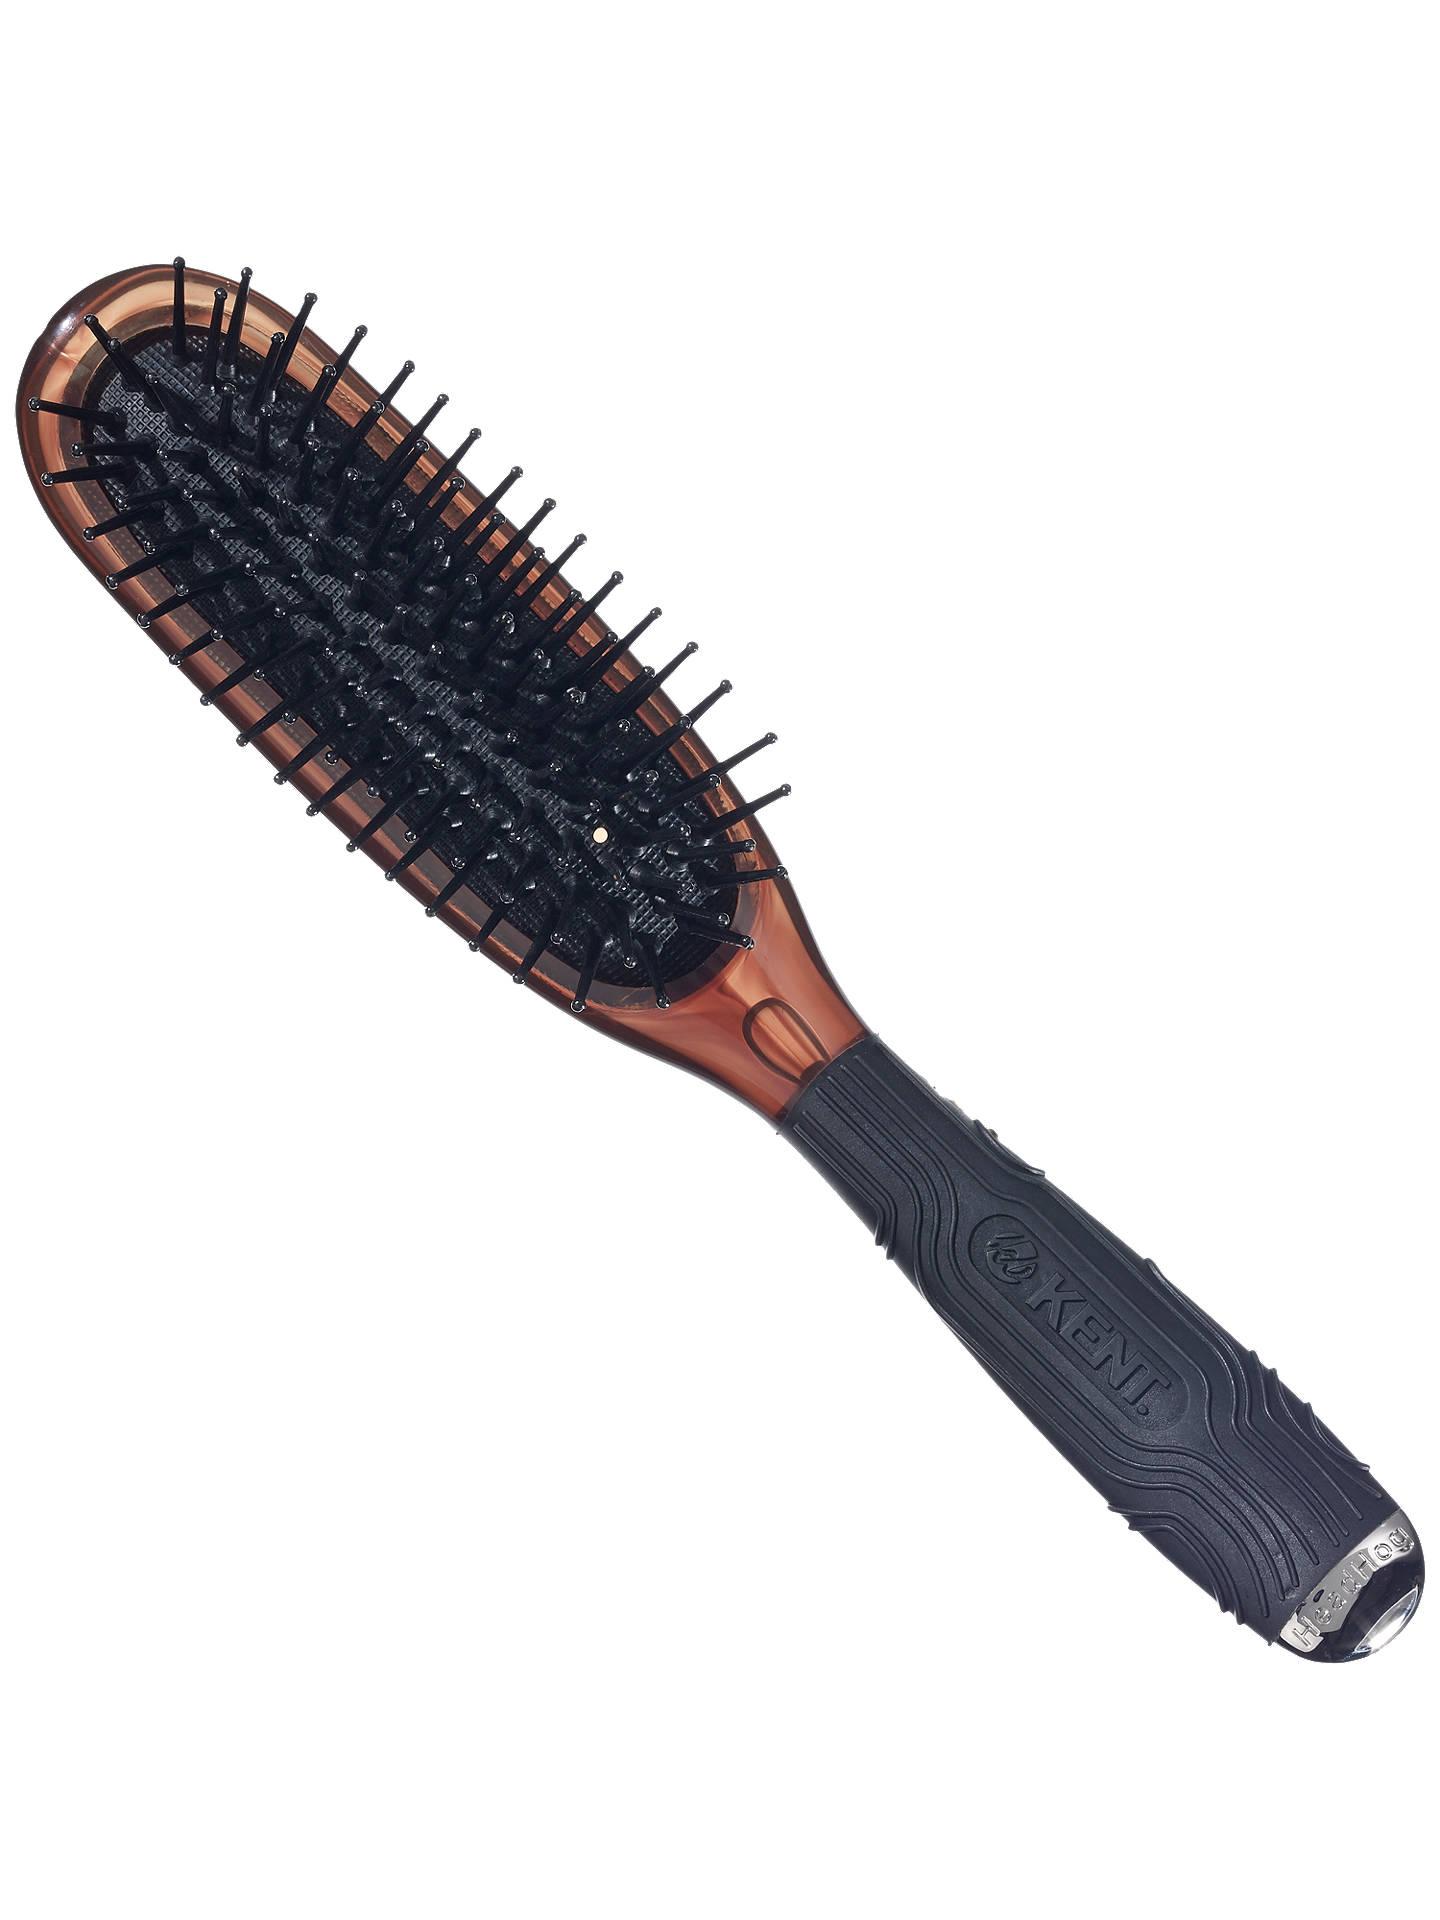 Kent Headhog Cushioned Nylon Tipped Hairbrush At John Lewis Partners Hair Brus Buykent Online